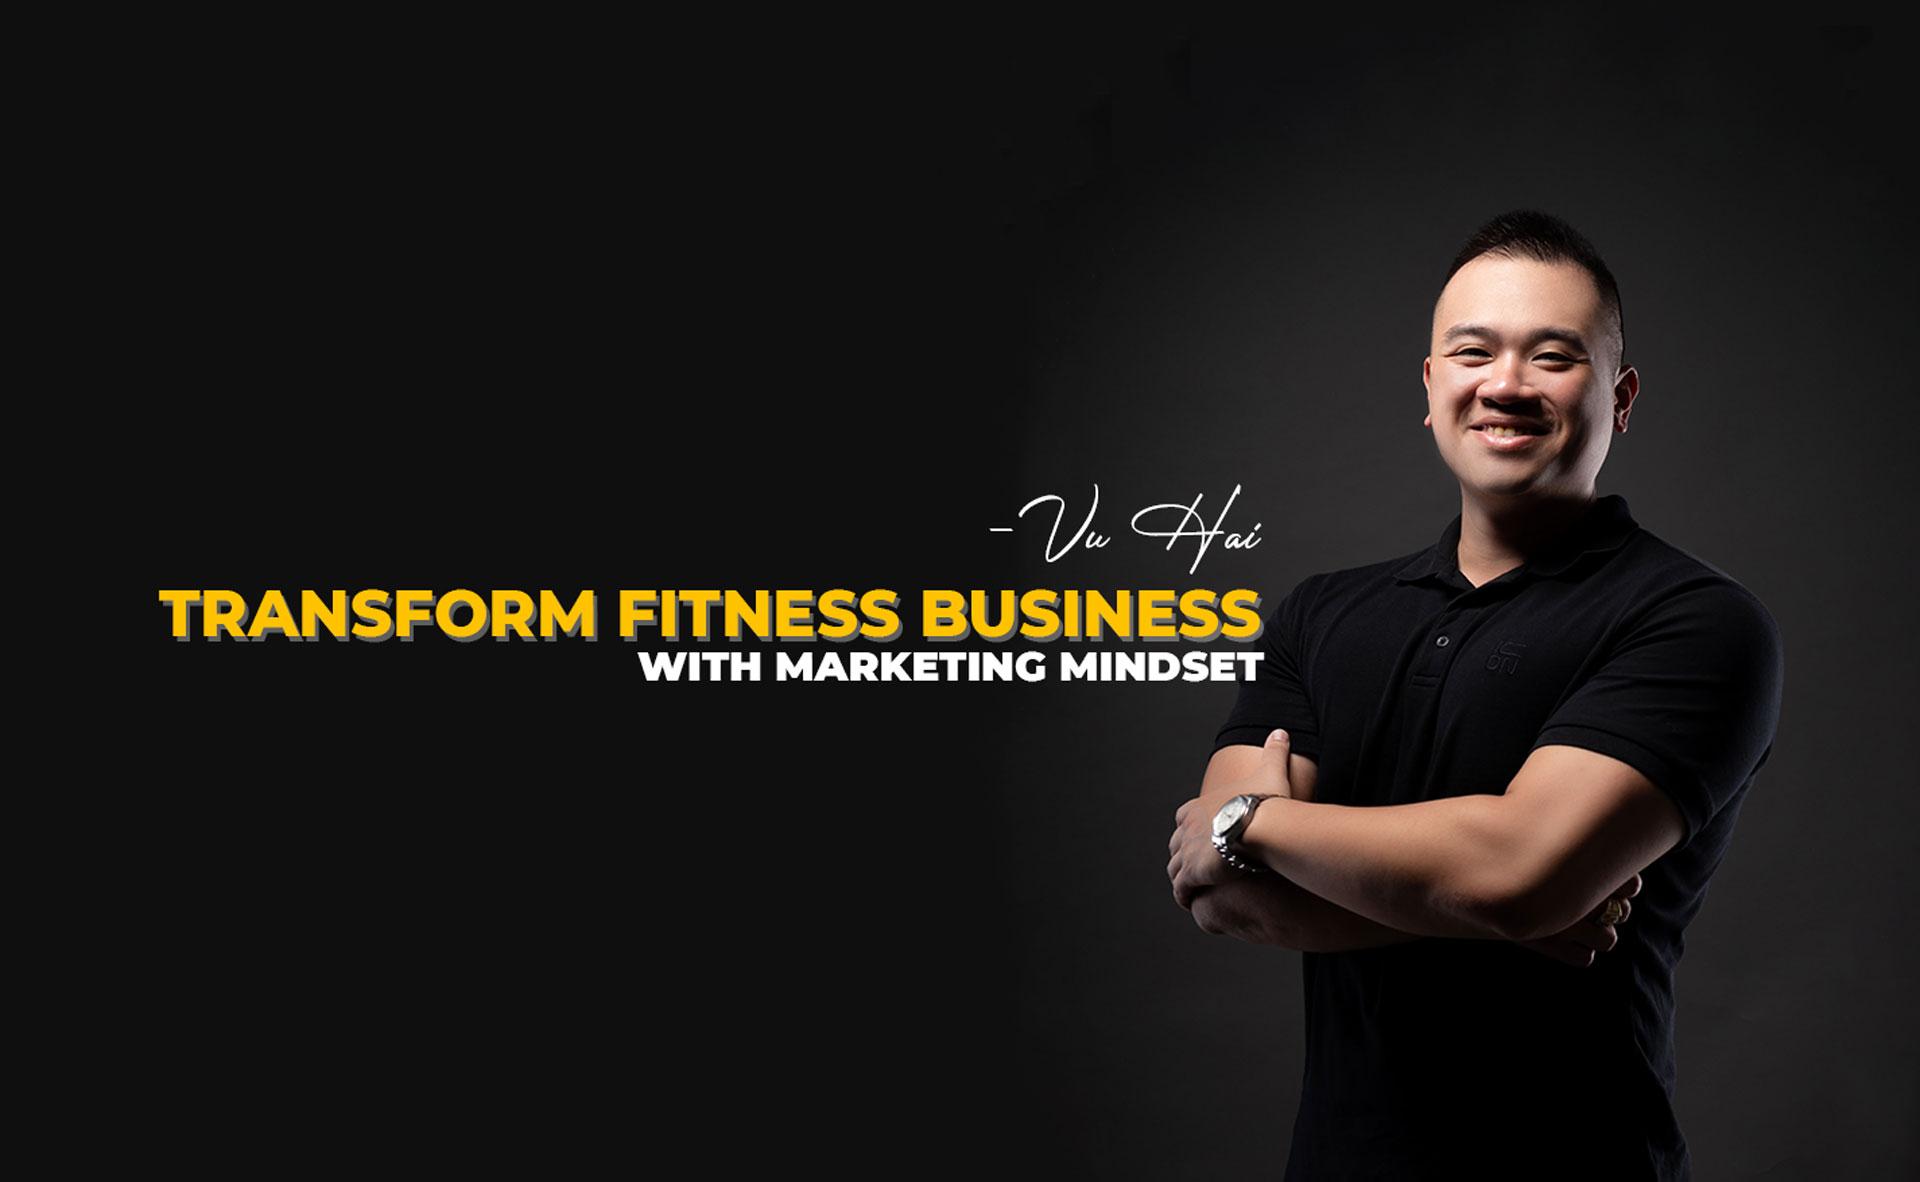 Fitness Marketing Expert - Vũ Hải